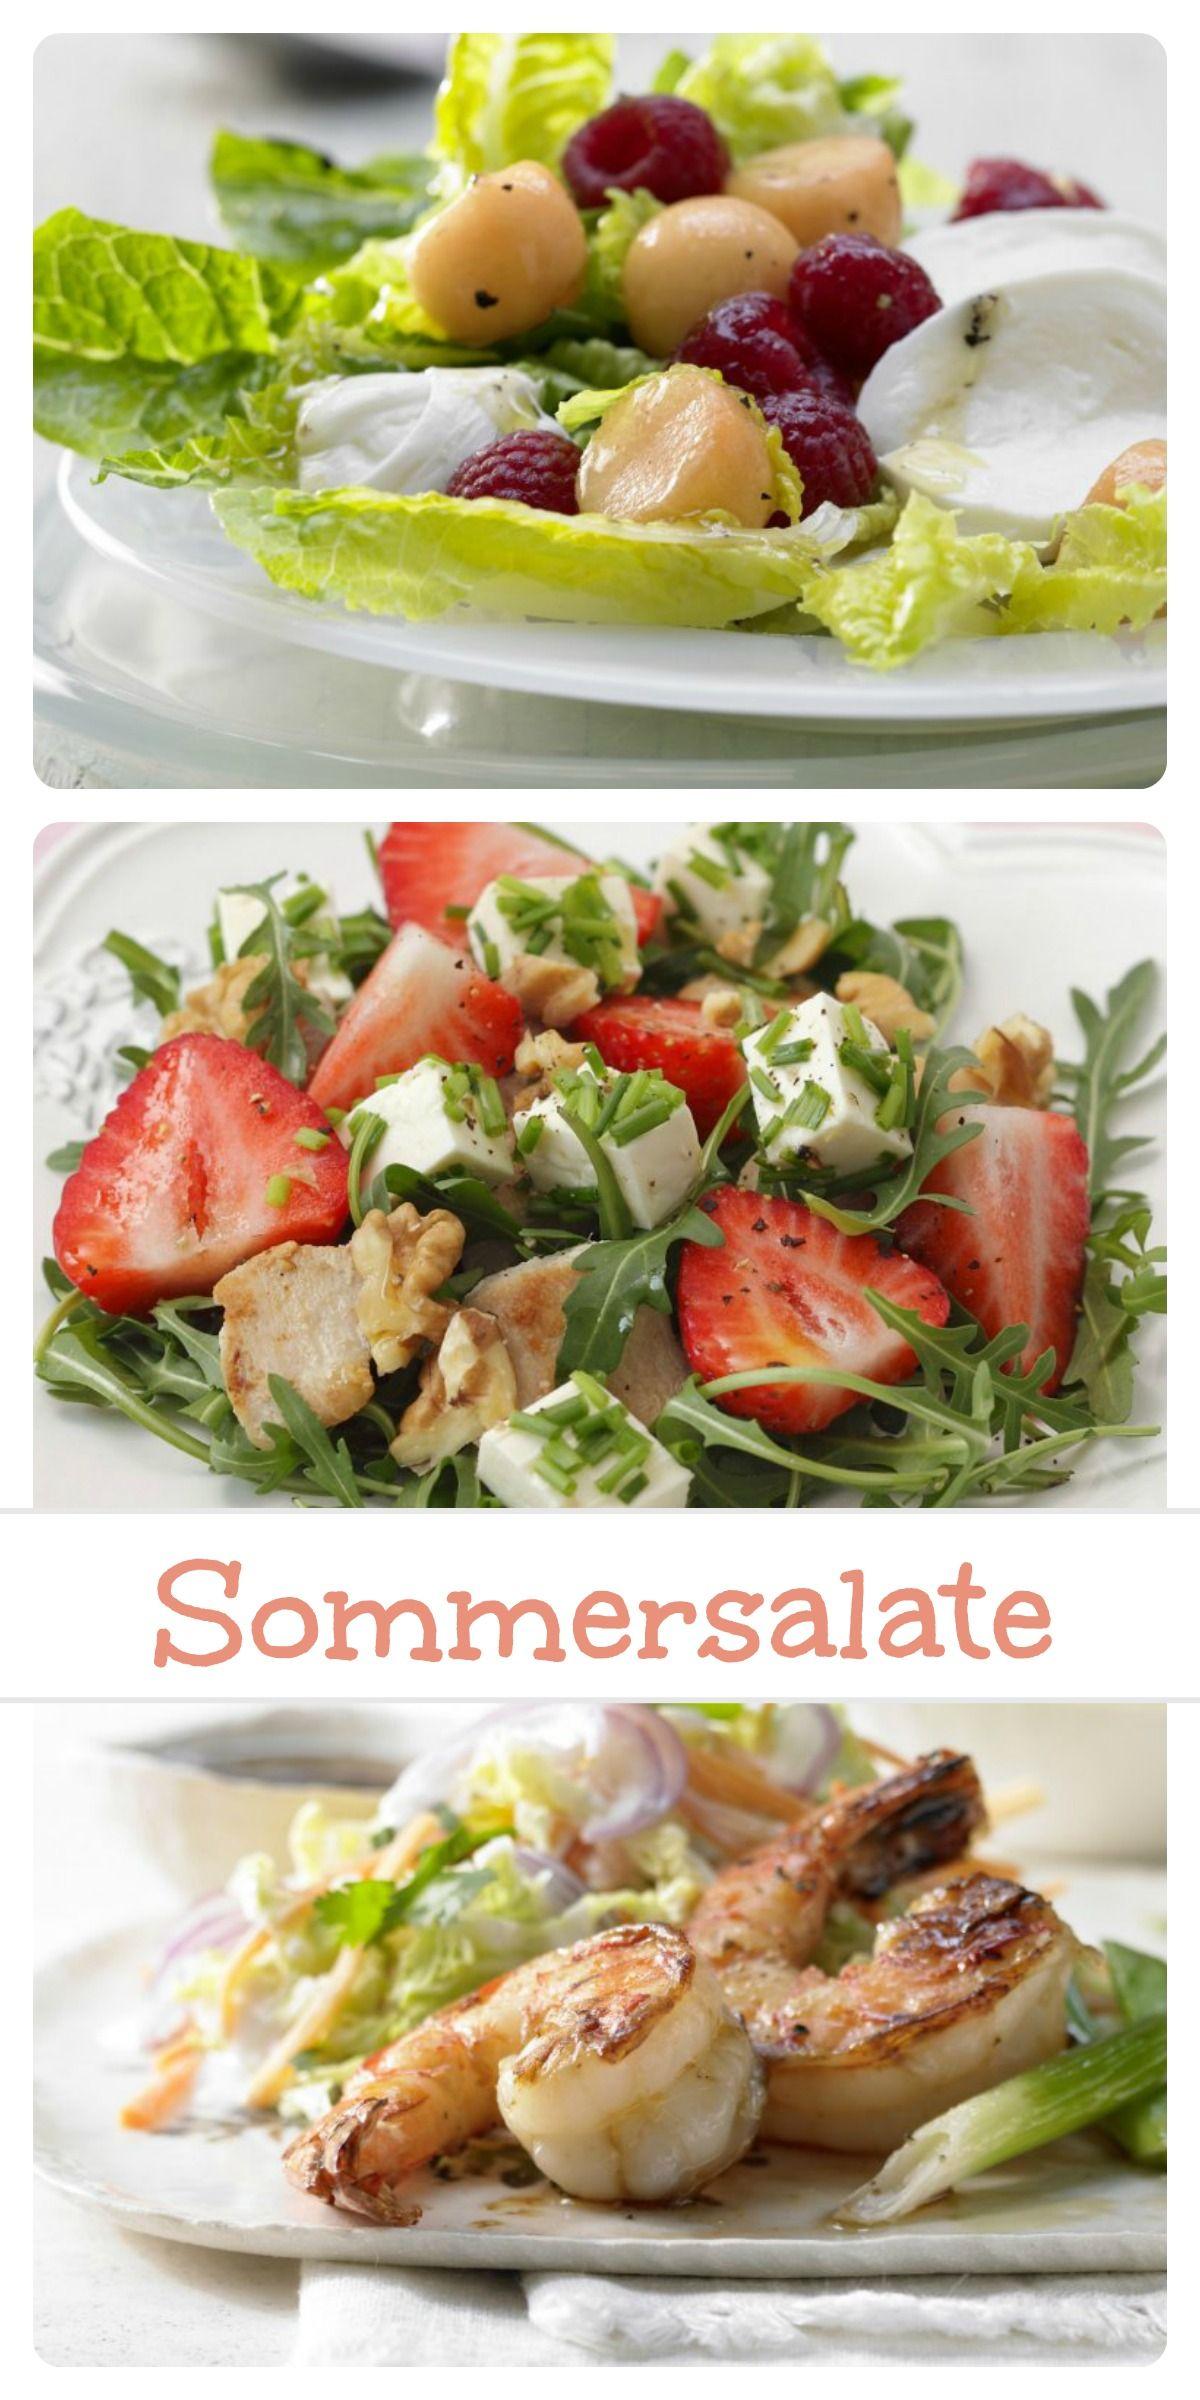 leckere salate warm beliebte eezepte f r n tzliche salate. Black Bedroom Furniture Sets. Home Design Ideas